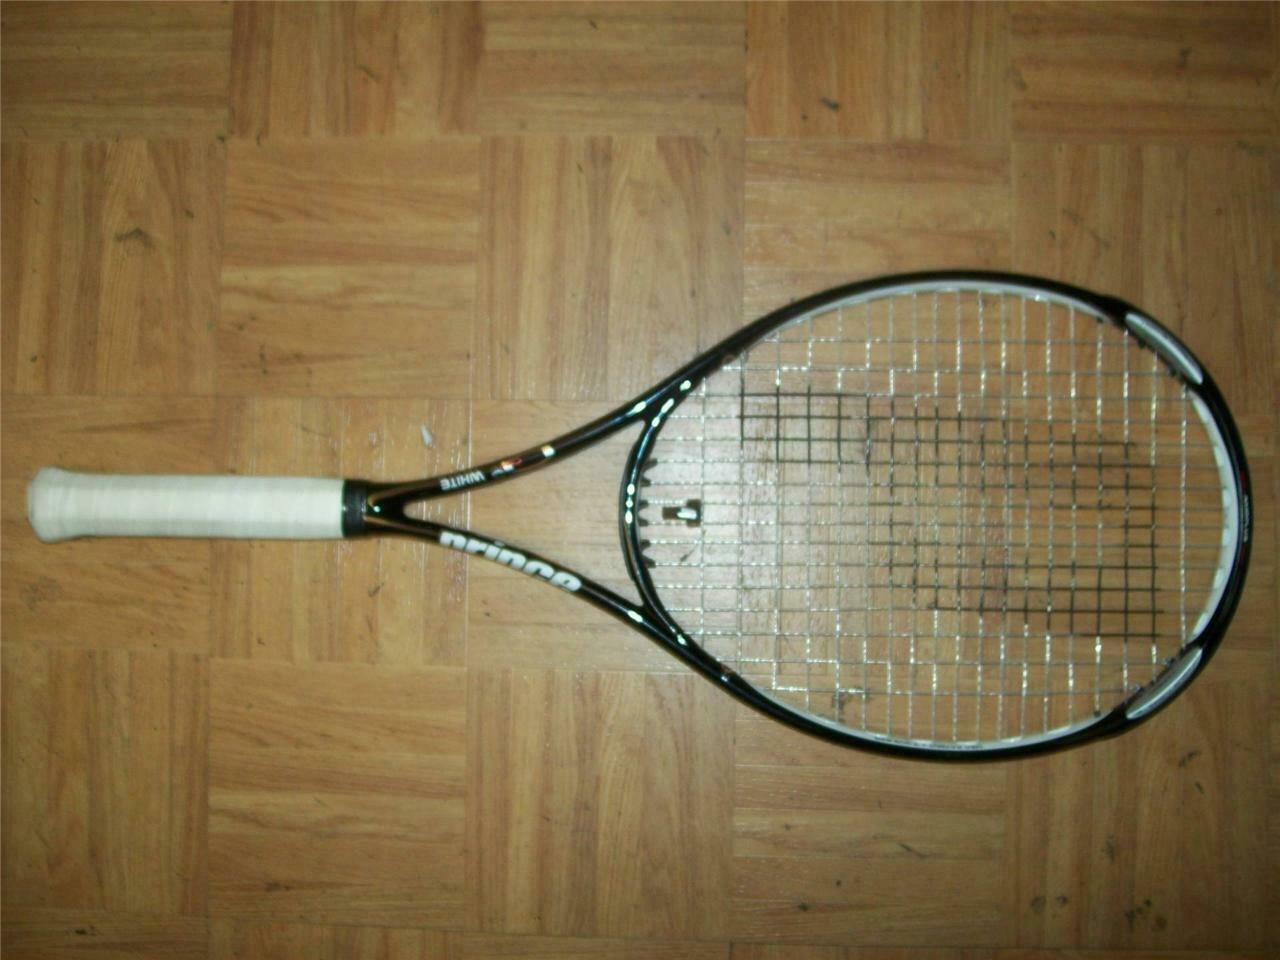 Prince O3 White 100 head 4 1 8 grip 10.6oz Tennis Racquet